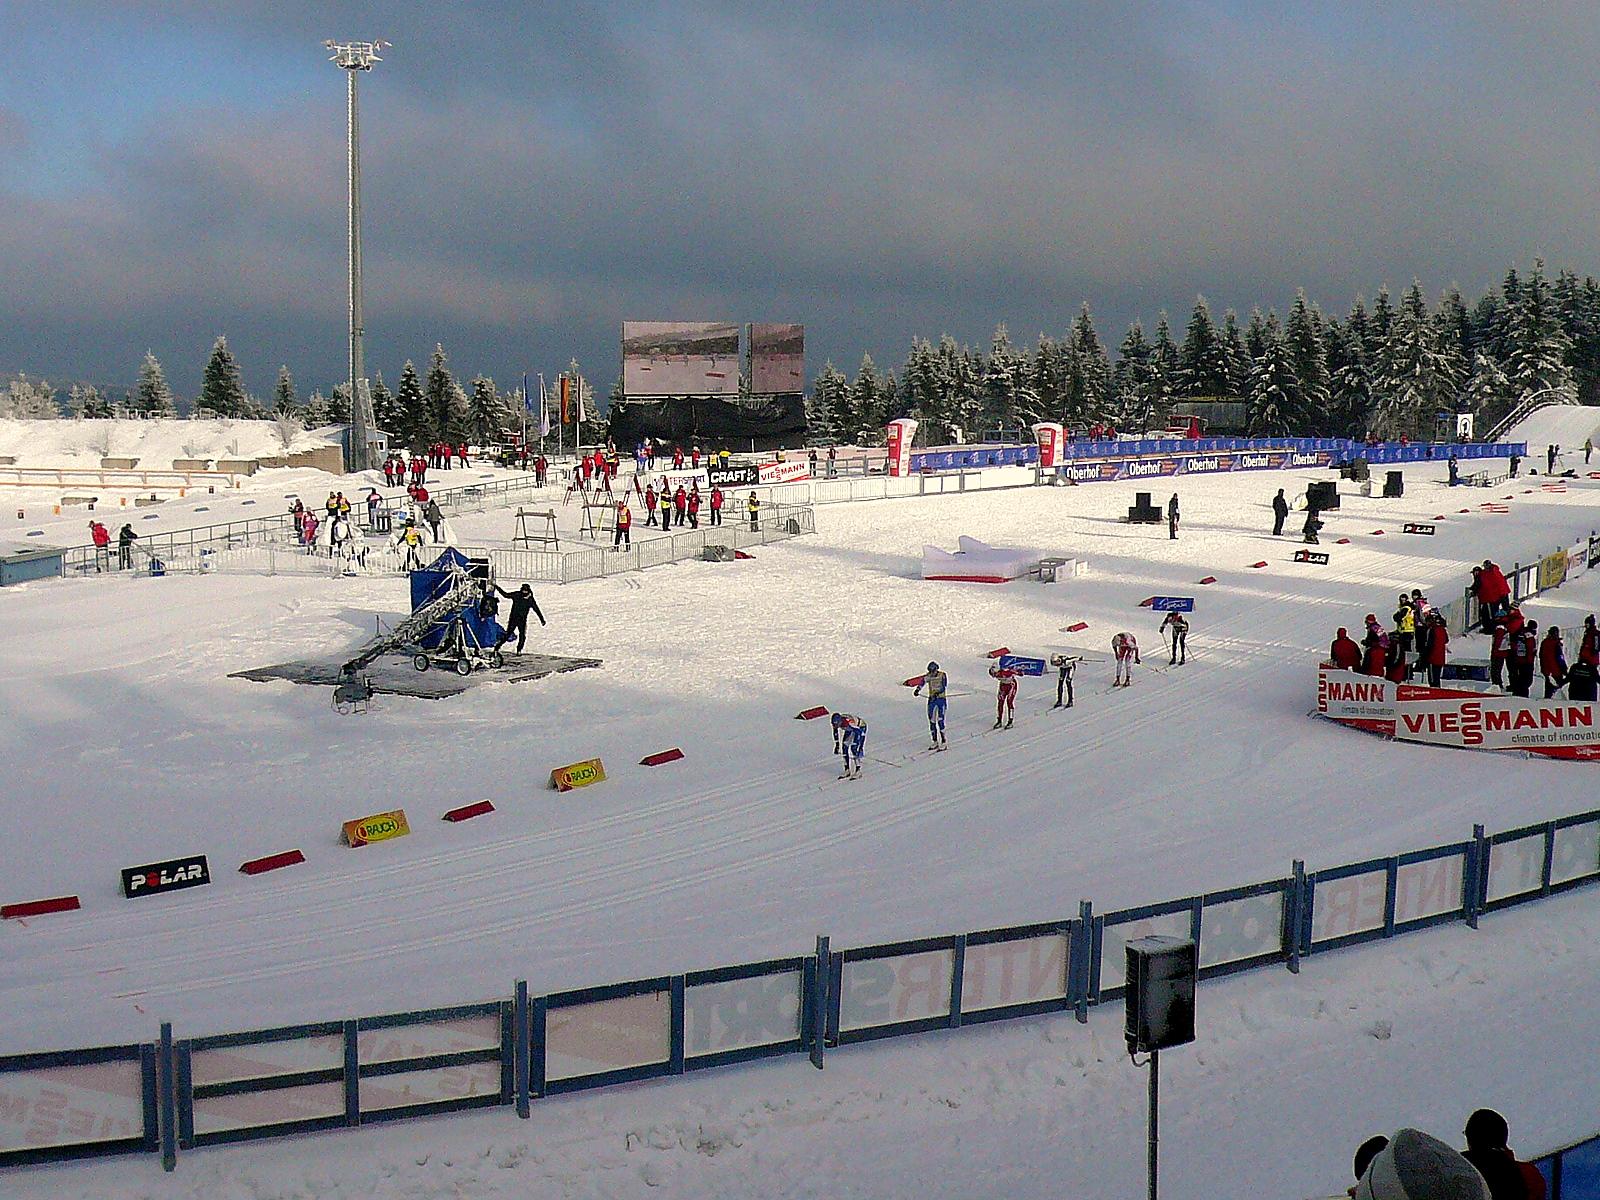 Oberhof Ski File:dkb-ski-arena Oberhof